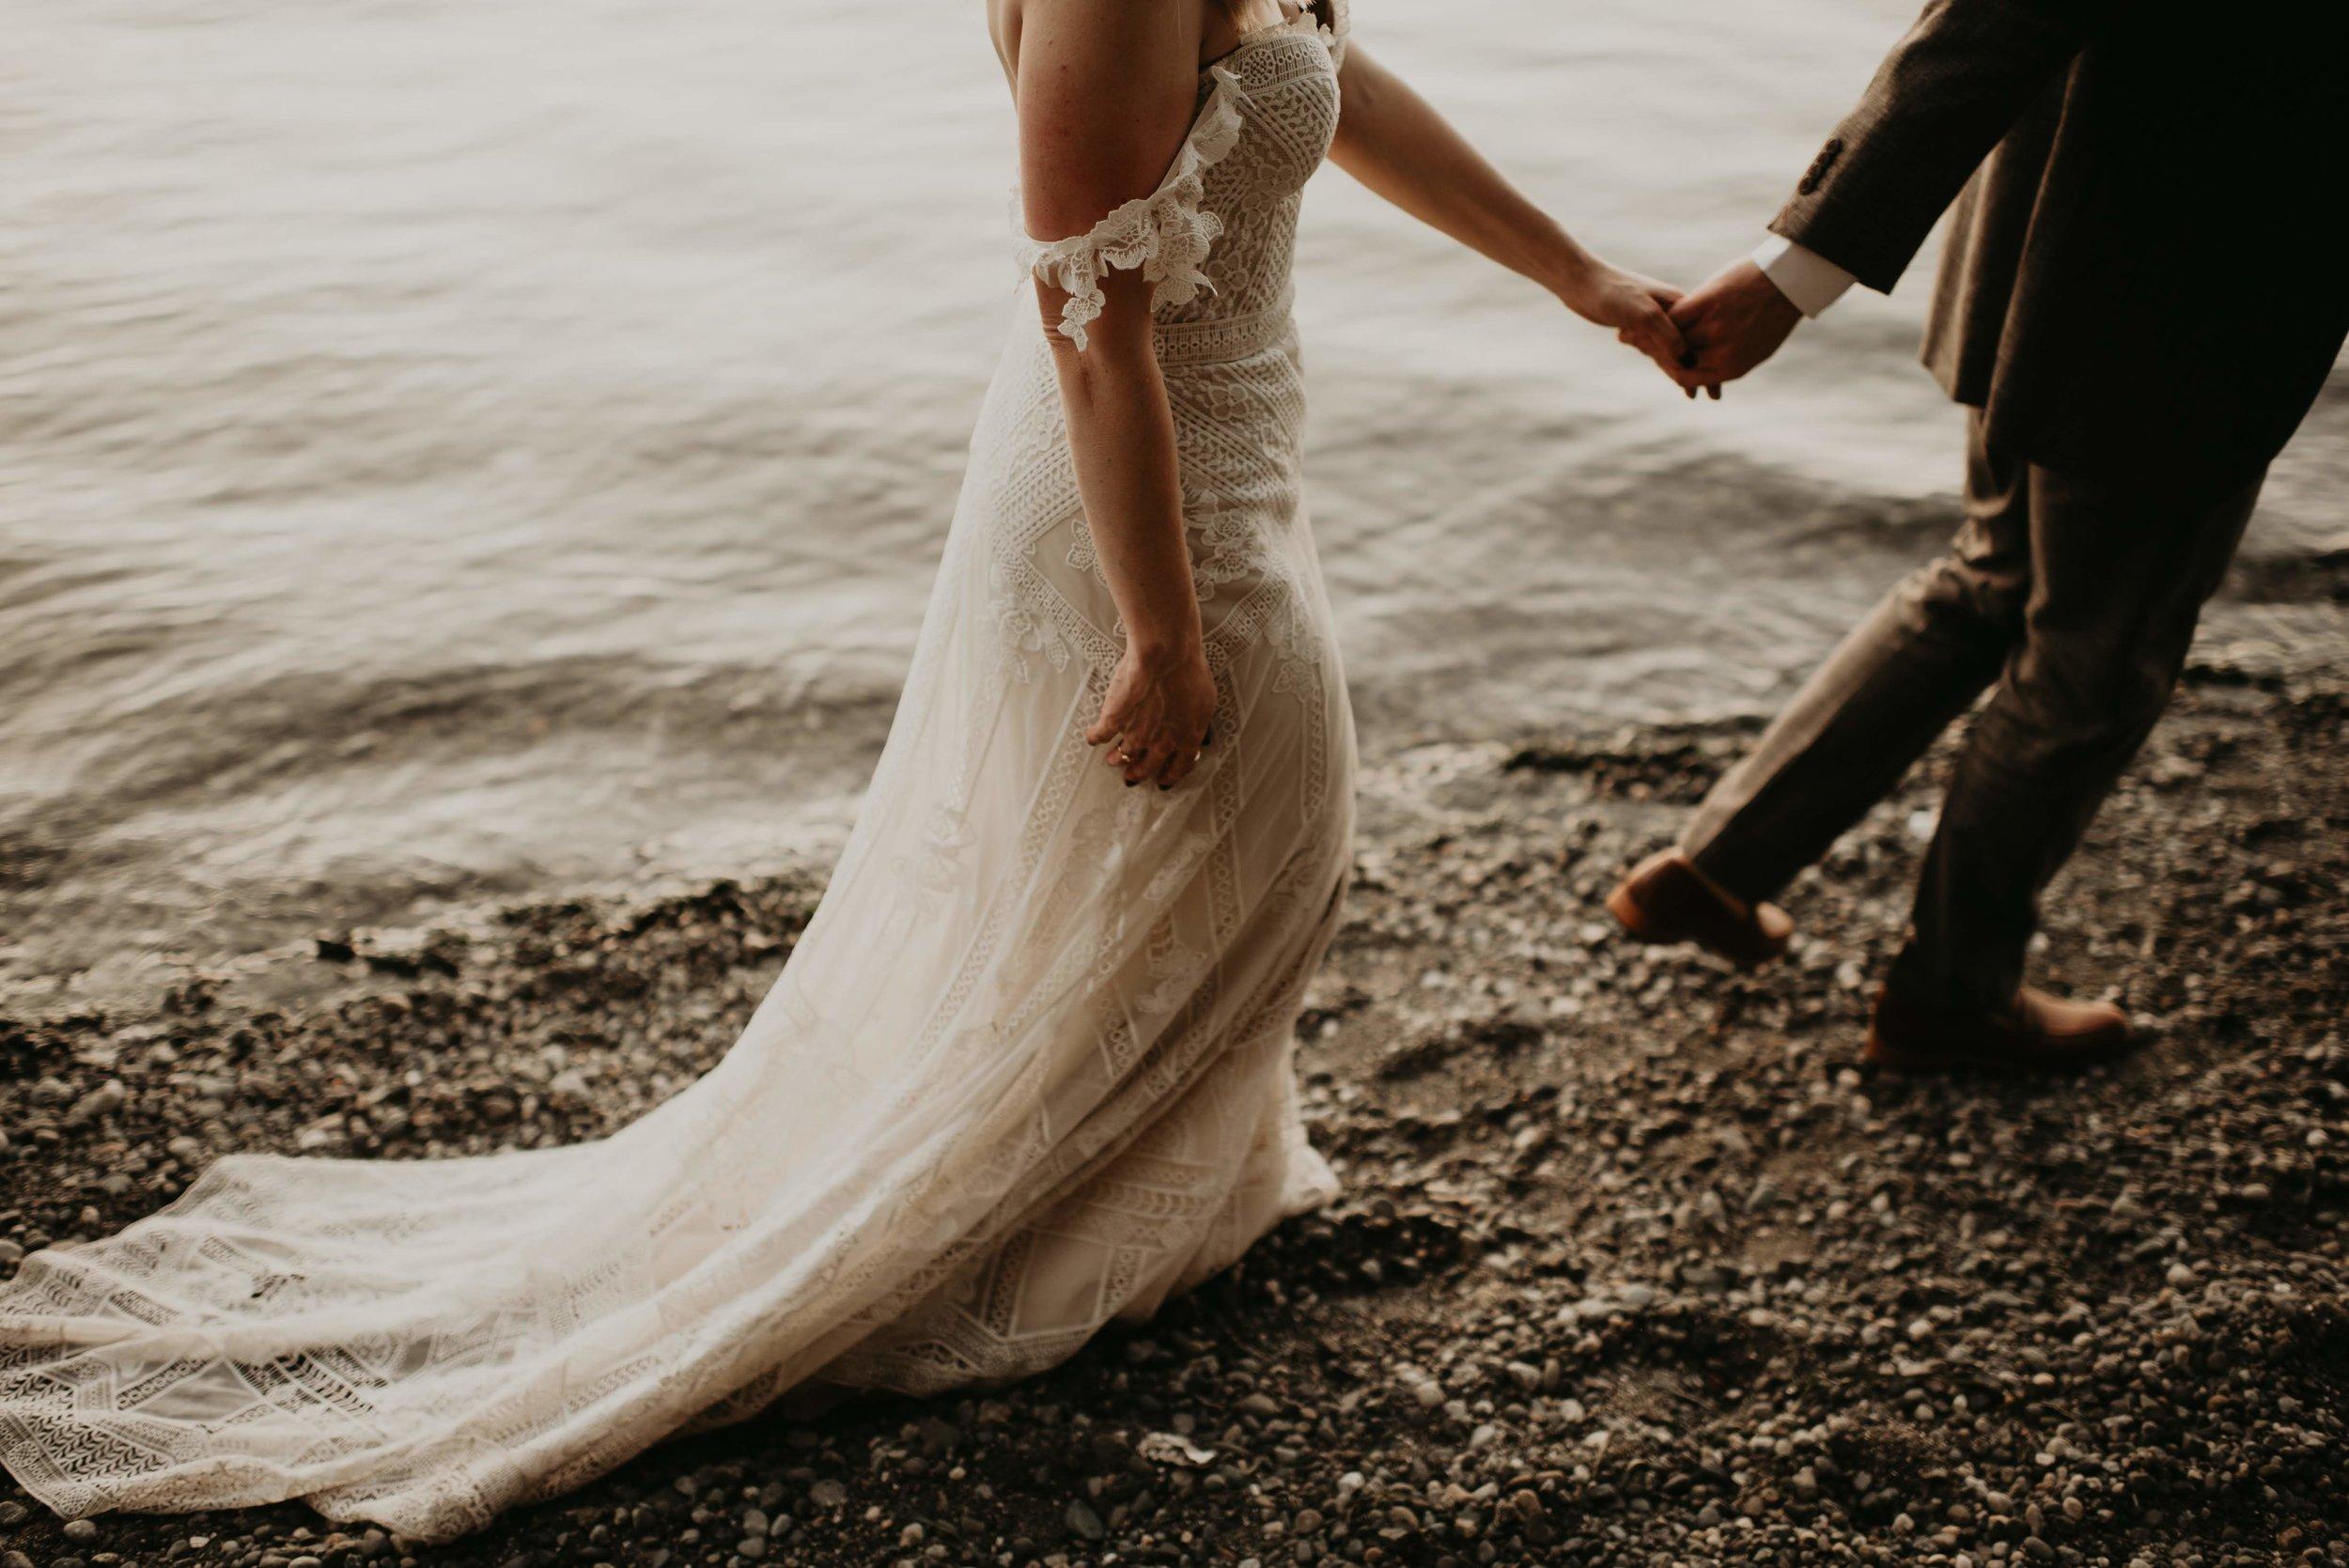 Ashley + Peter Wedding - Kitsap Memorial State Park - Kamra Fuller Photography-1020.jpg